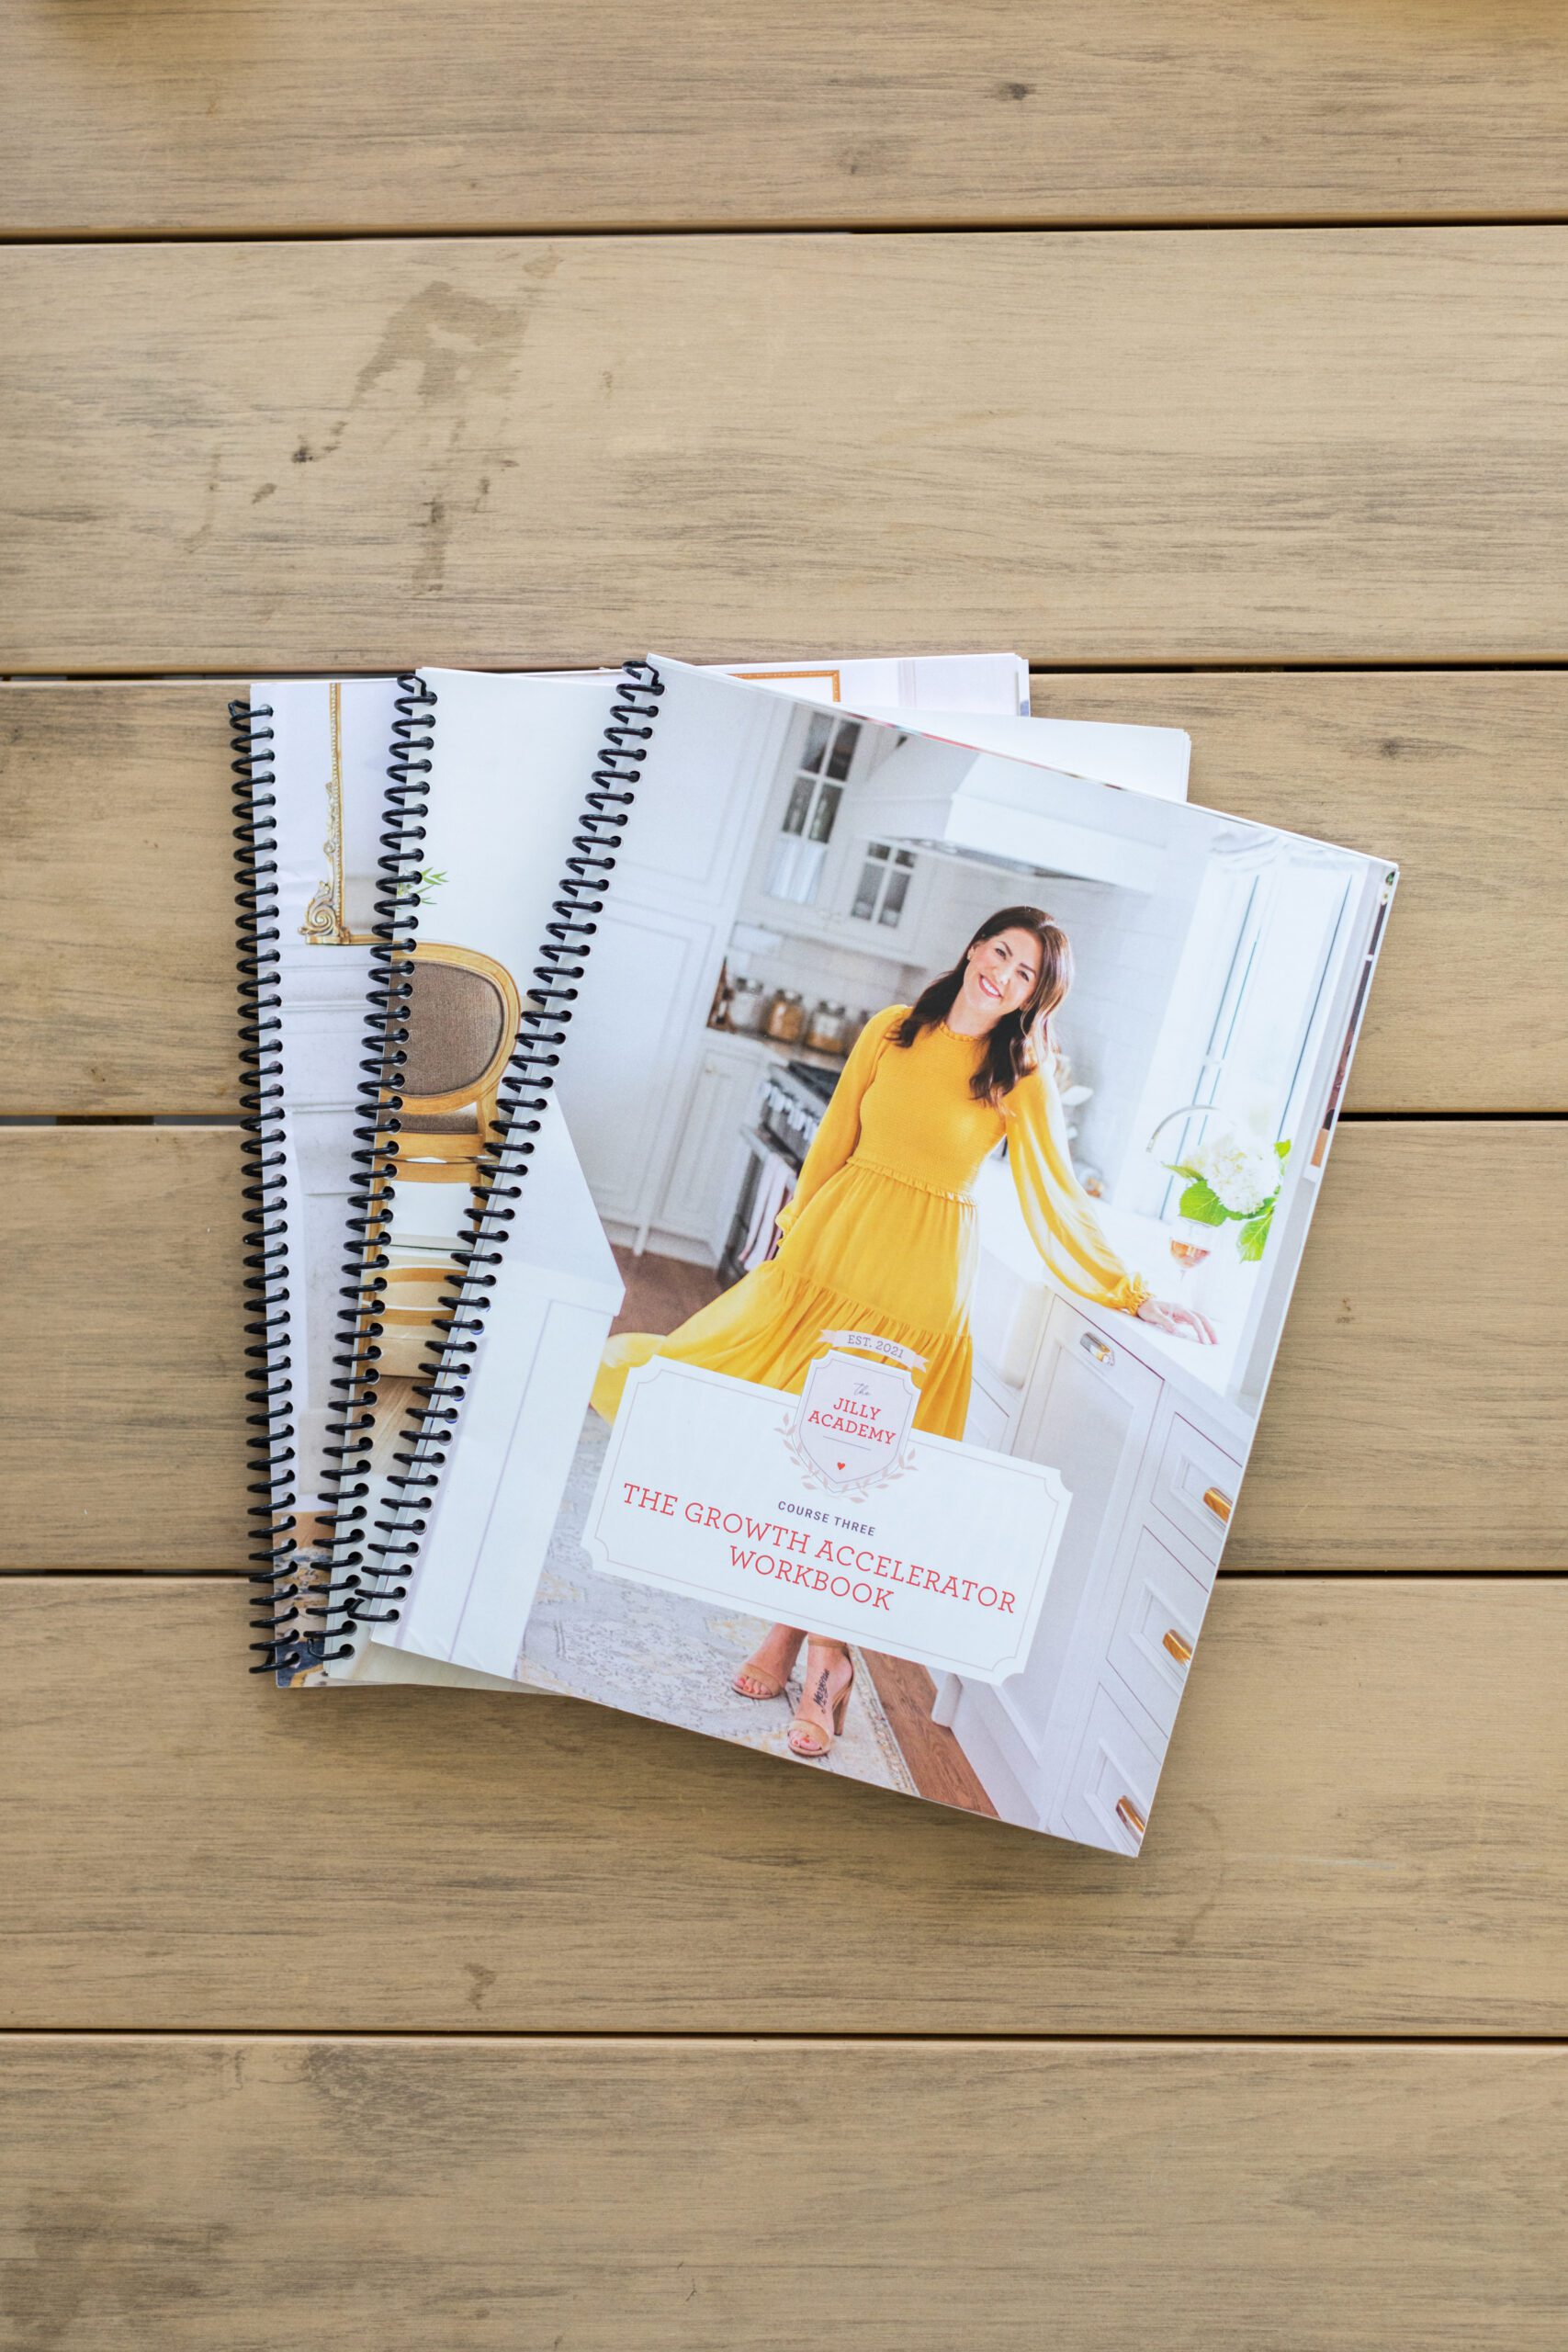 Jillian Harris' Workbooks for The Jilly Academy, ready for the Fall Semester.